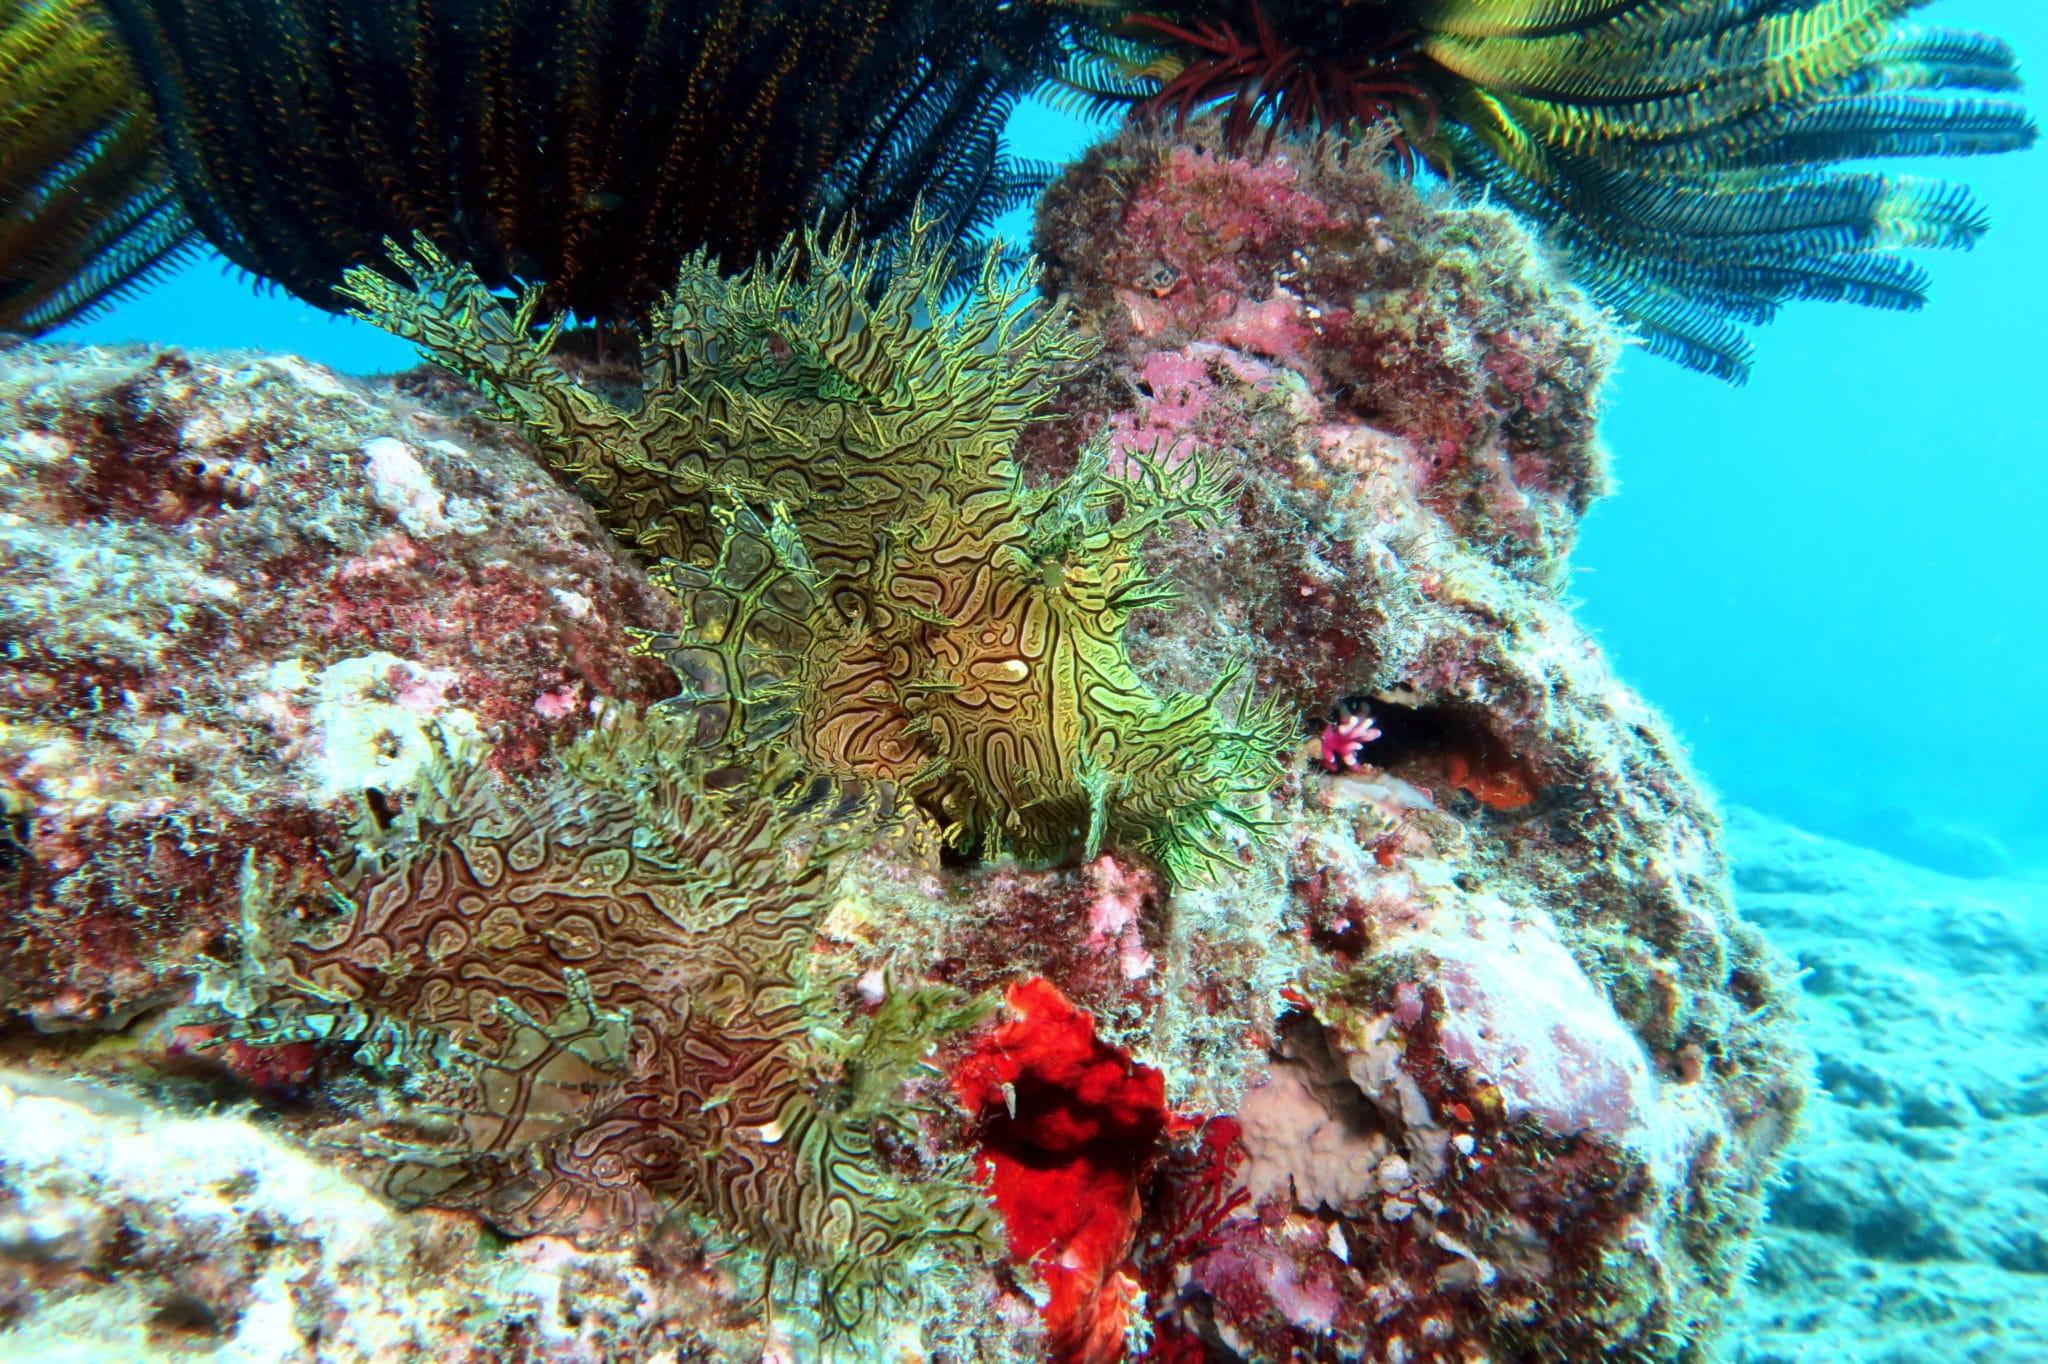 Scuba diving Poindimié New Caledonia